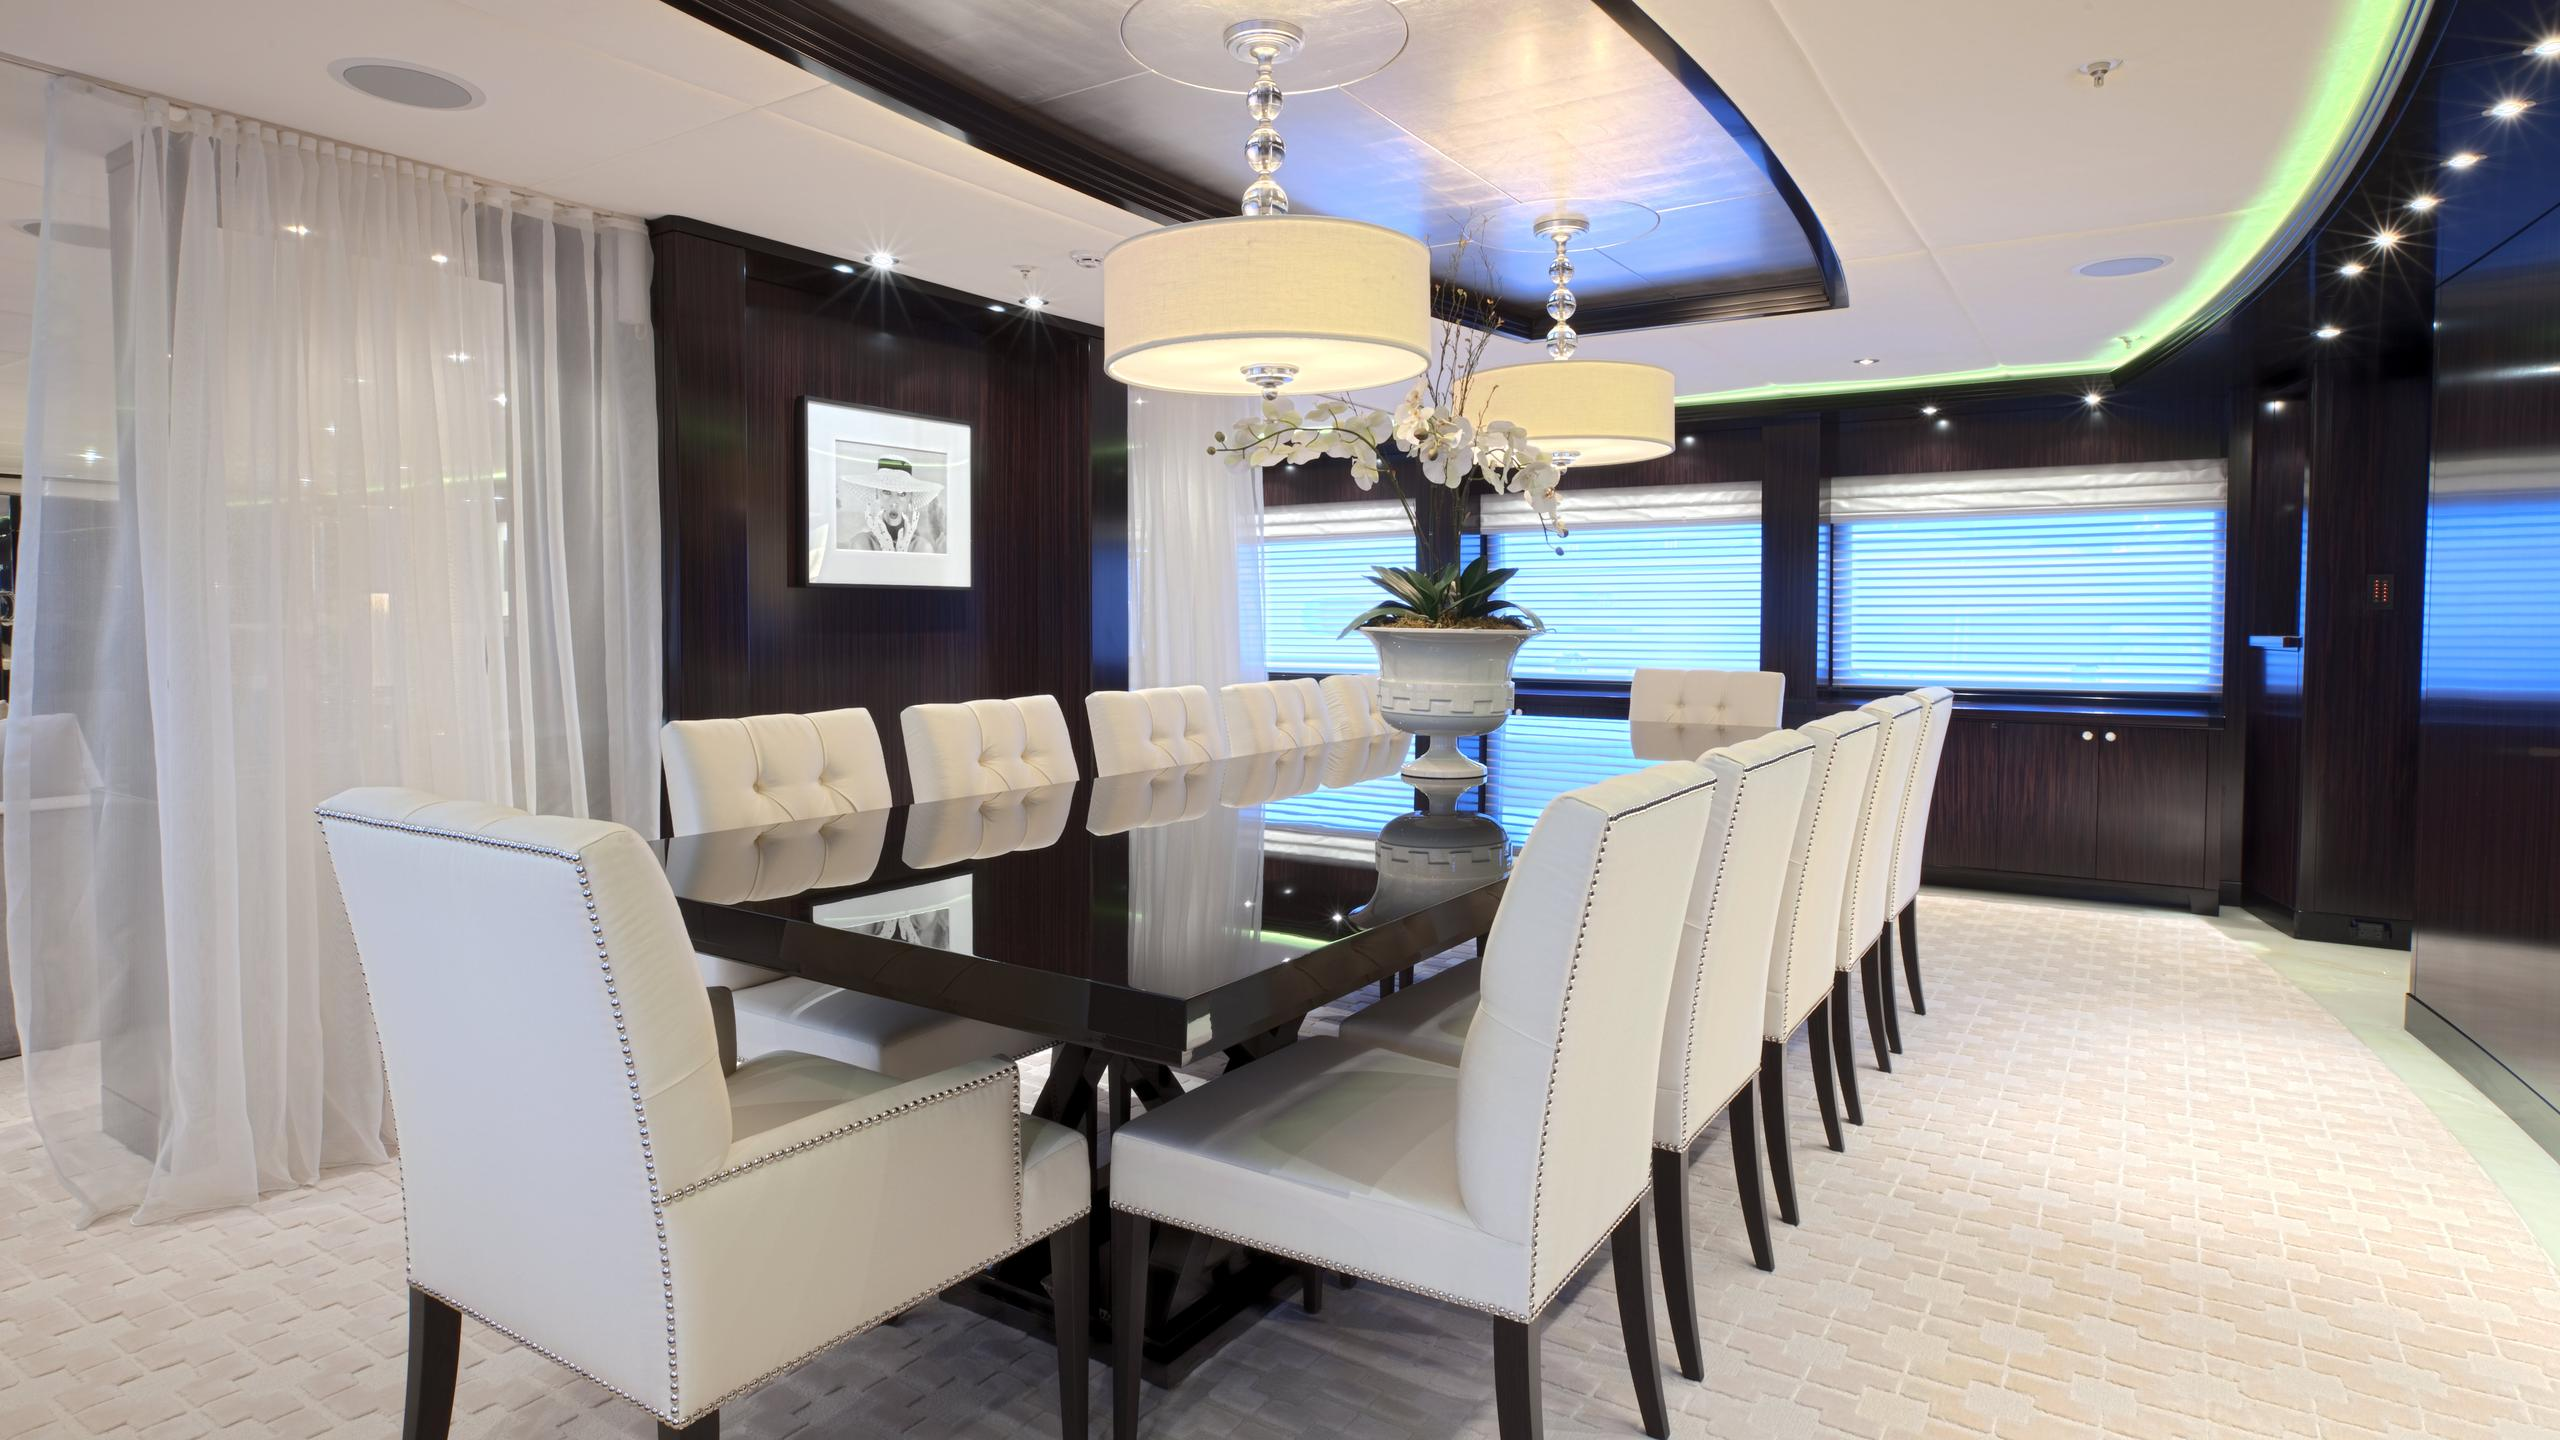 CARPE-DIEM-motor-yacht-trinity-2011-58m-dining-room